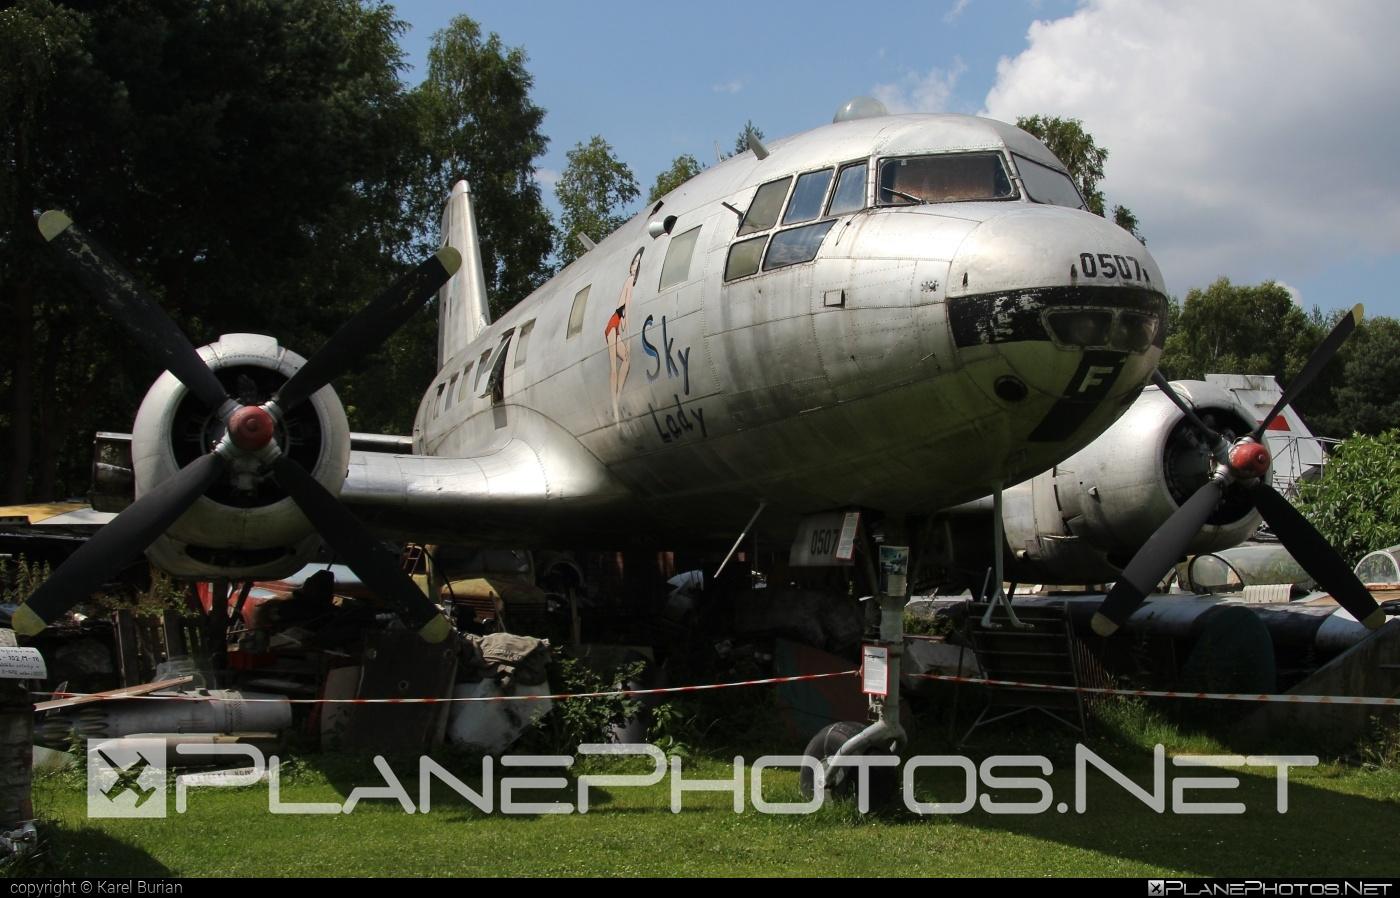 Ilyushin Il-14P - 0507 operated by Letectvo ČSĽA (Czechoslovak Air Force) #il14 #il14p #ilyushin